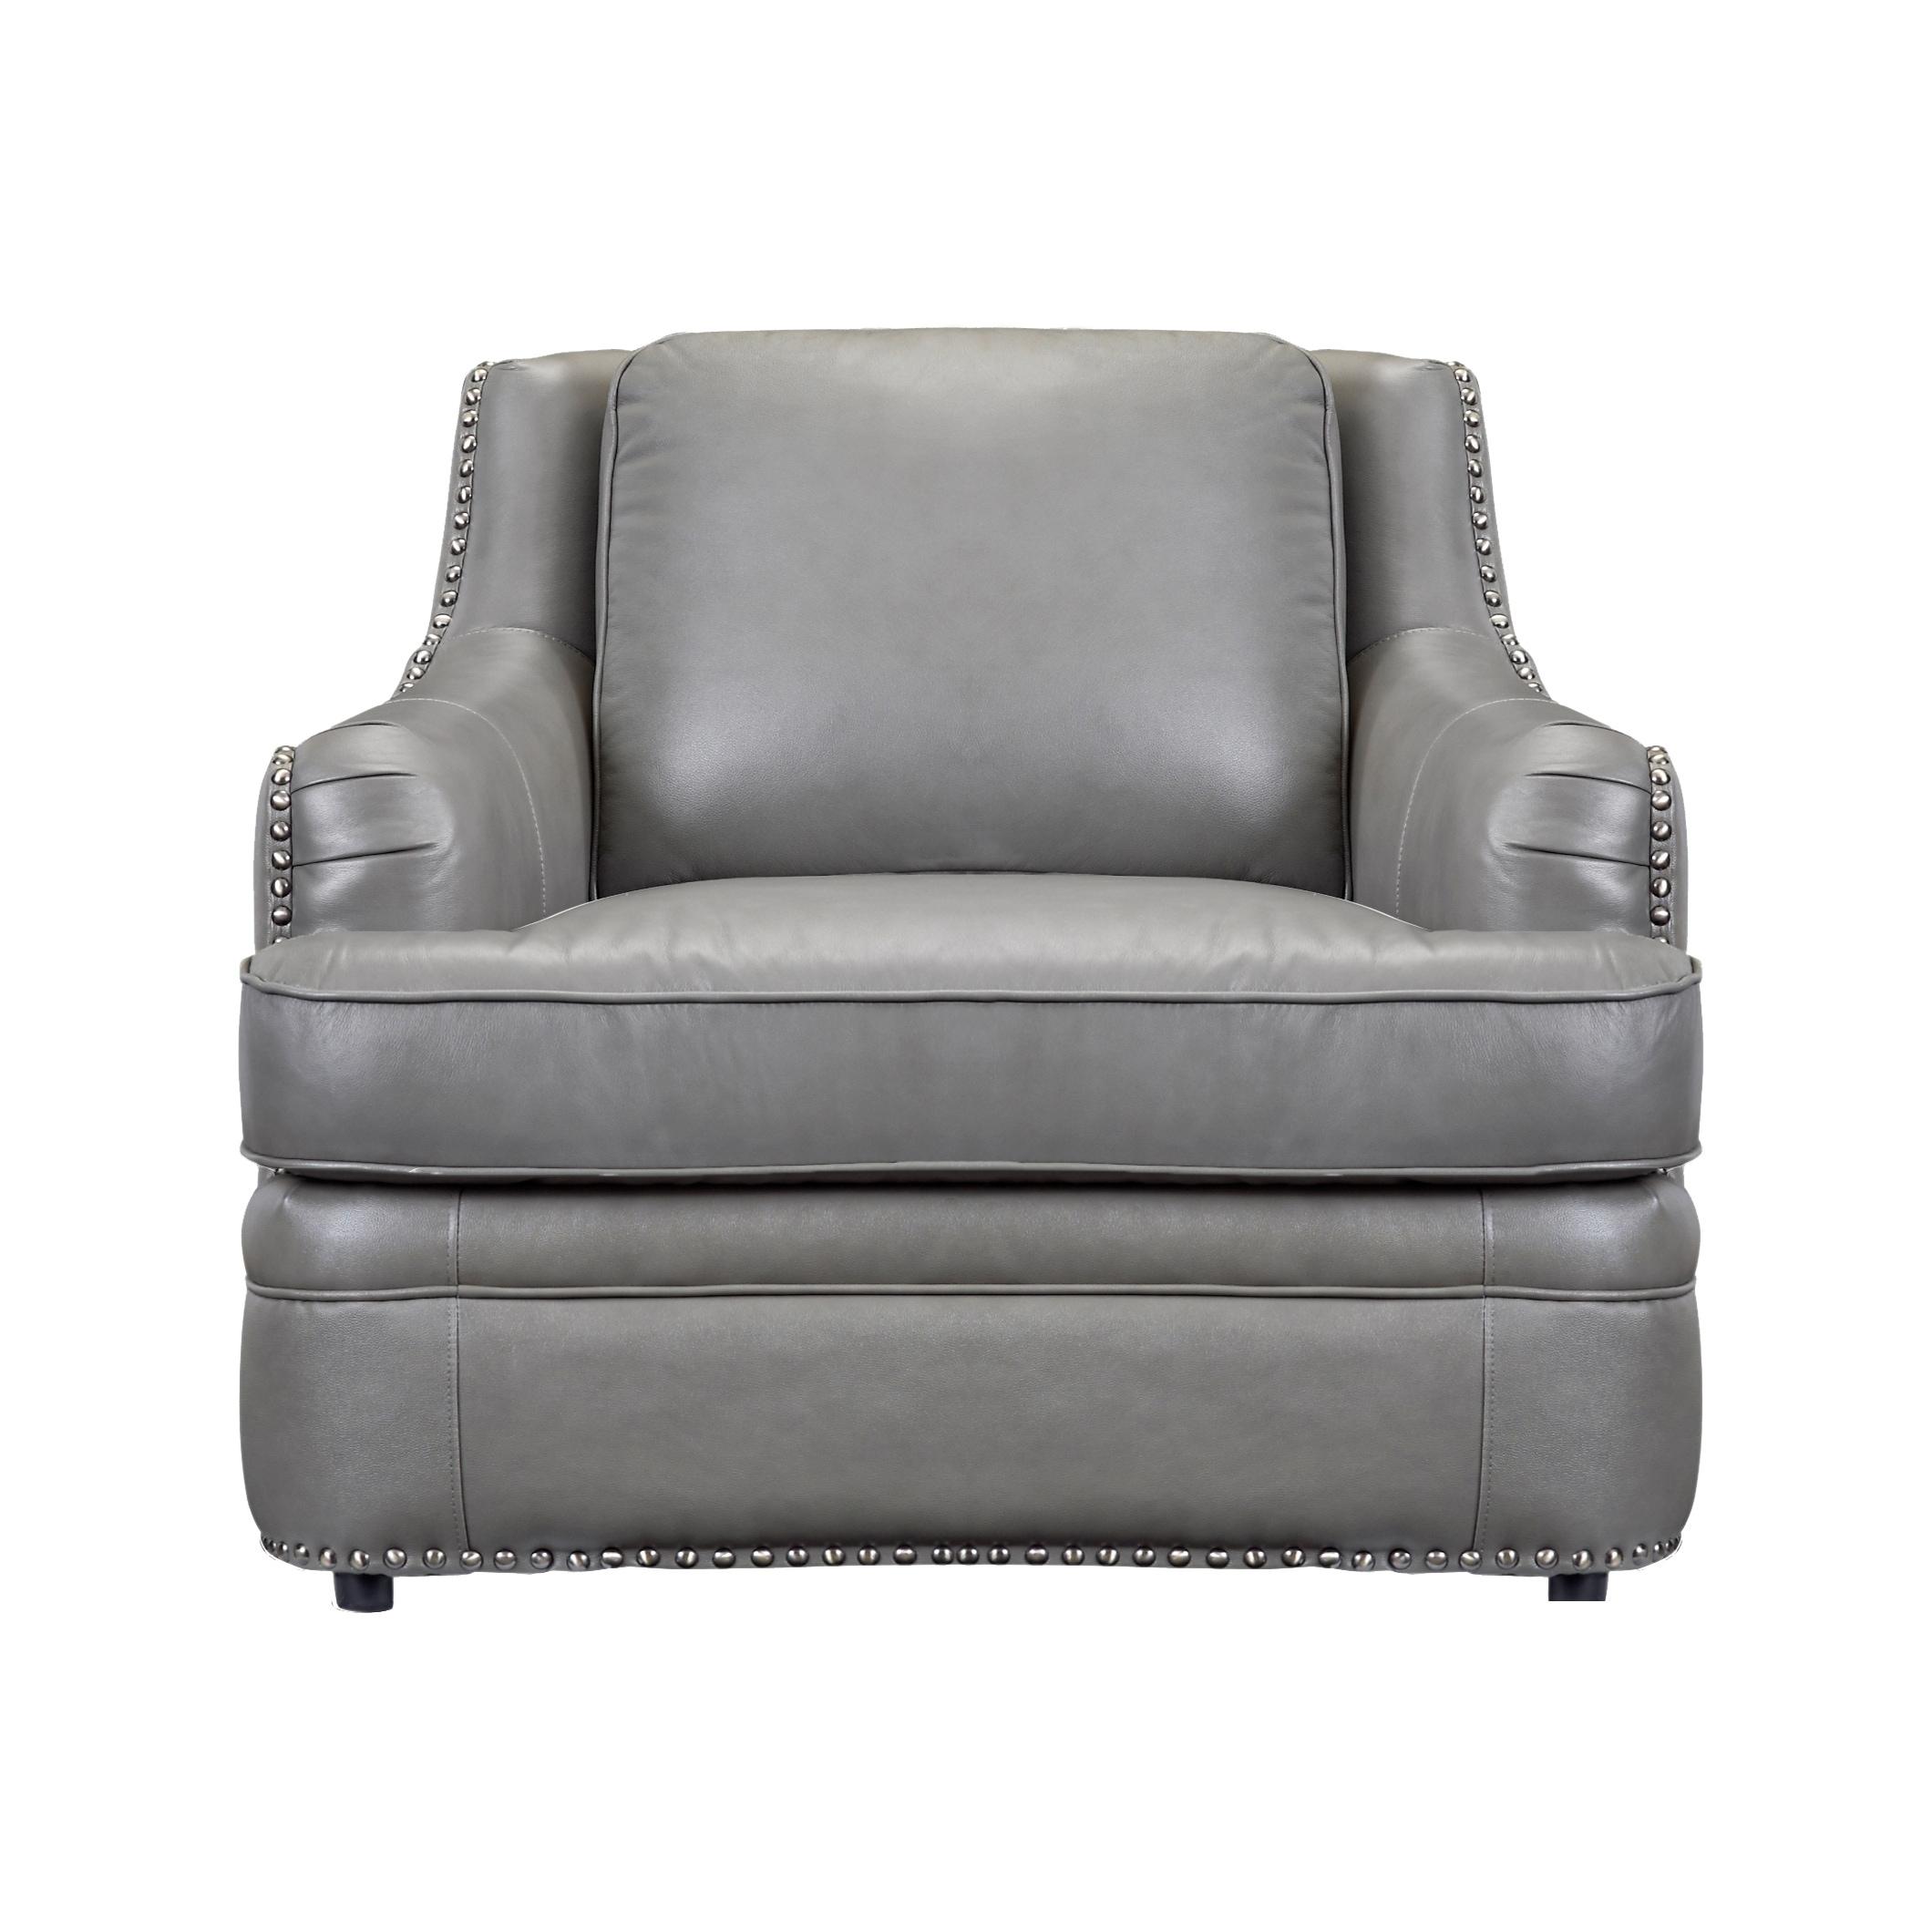 Calvin Top Grain Italian Leather Club Chair Free Shipping Today 18007979